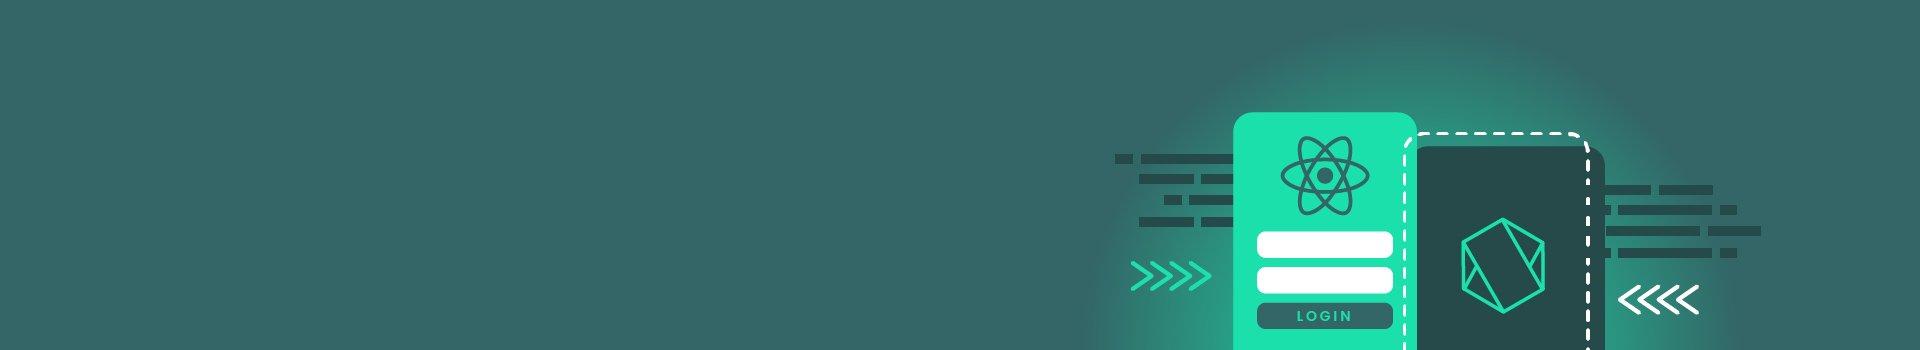 Build a React Native Login app with Node.js Backend